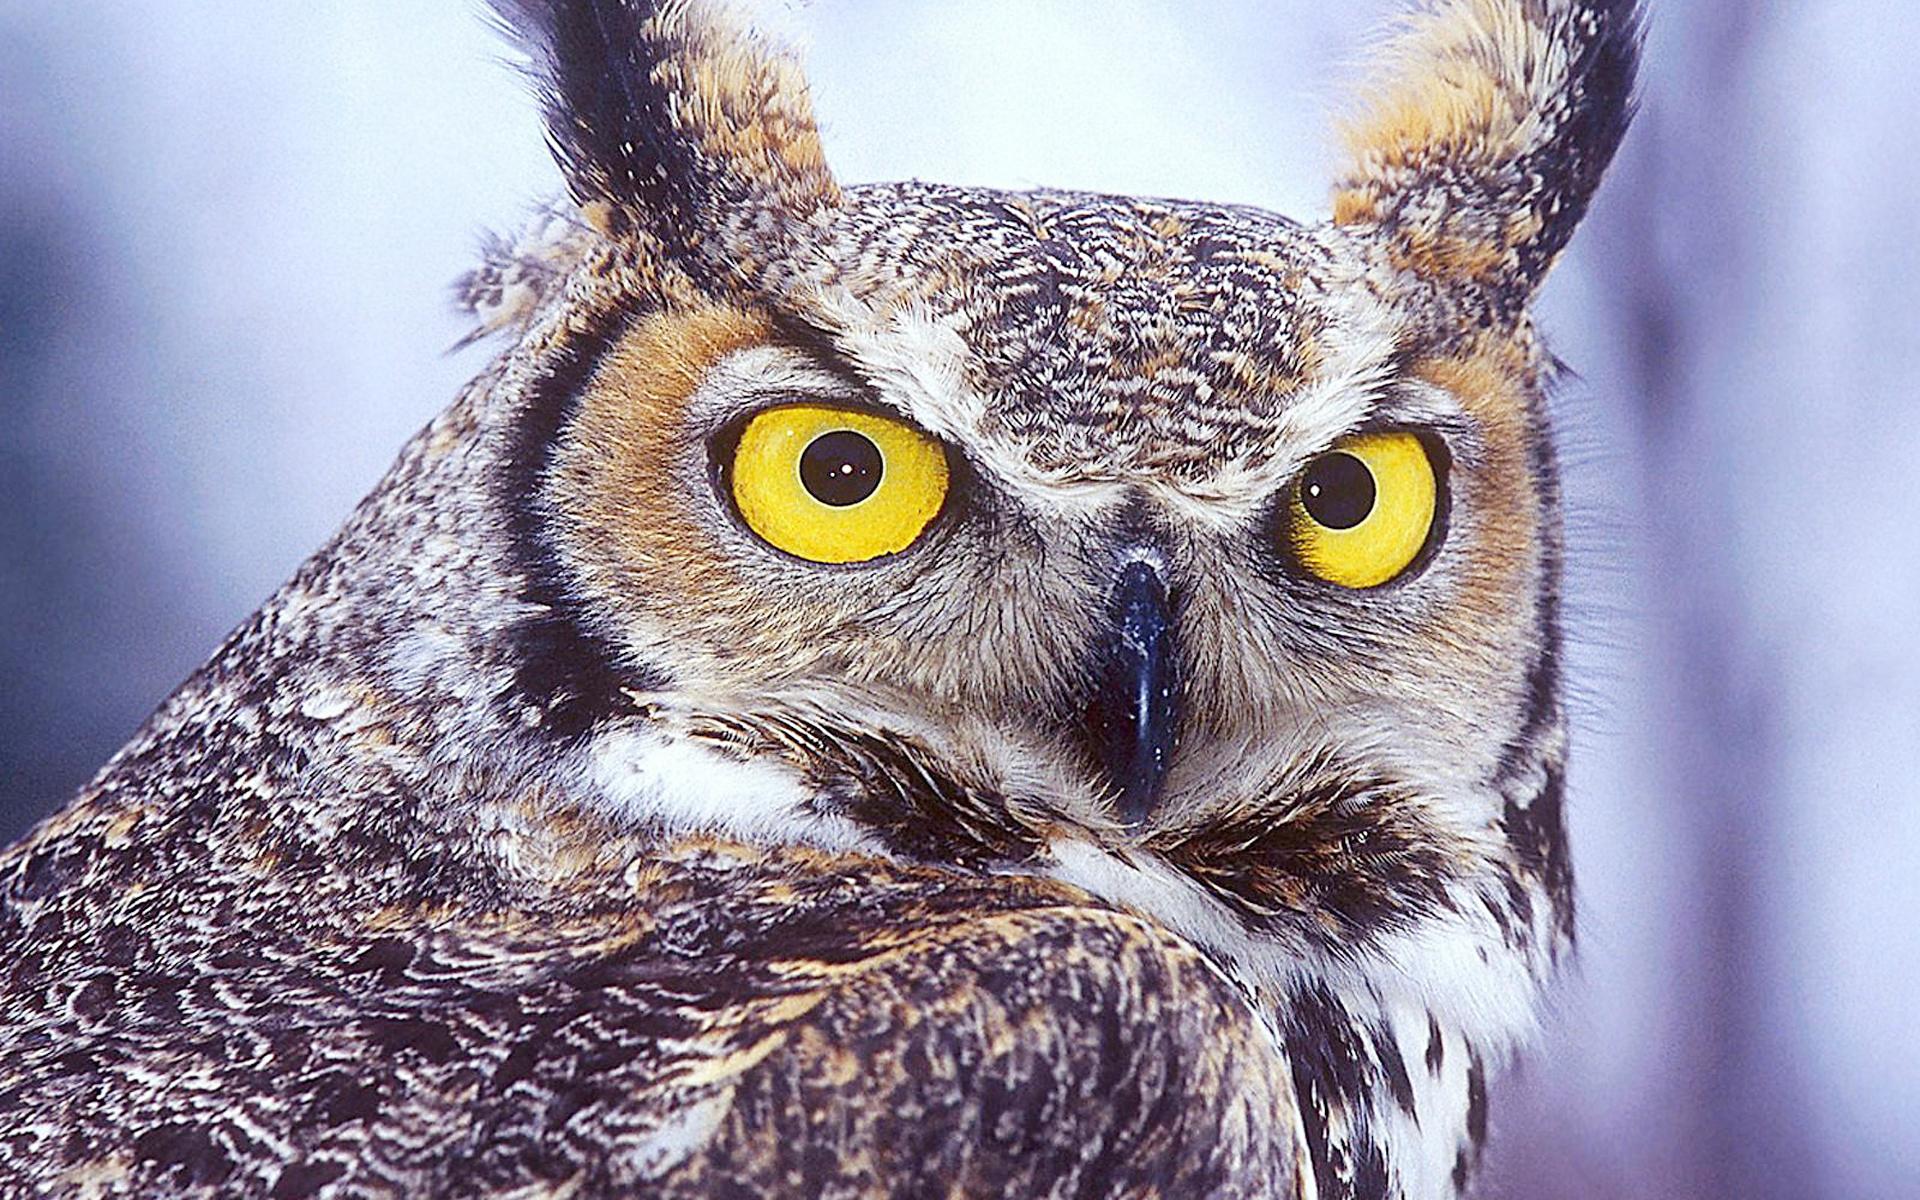 8k Animal Wallpaper Download: Beautiful Animals Wallpapers HD Desktop Widescreen Free